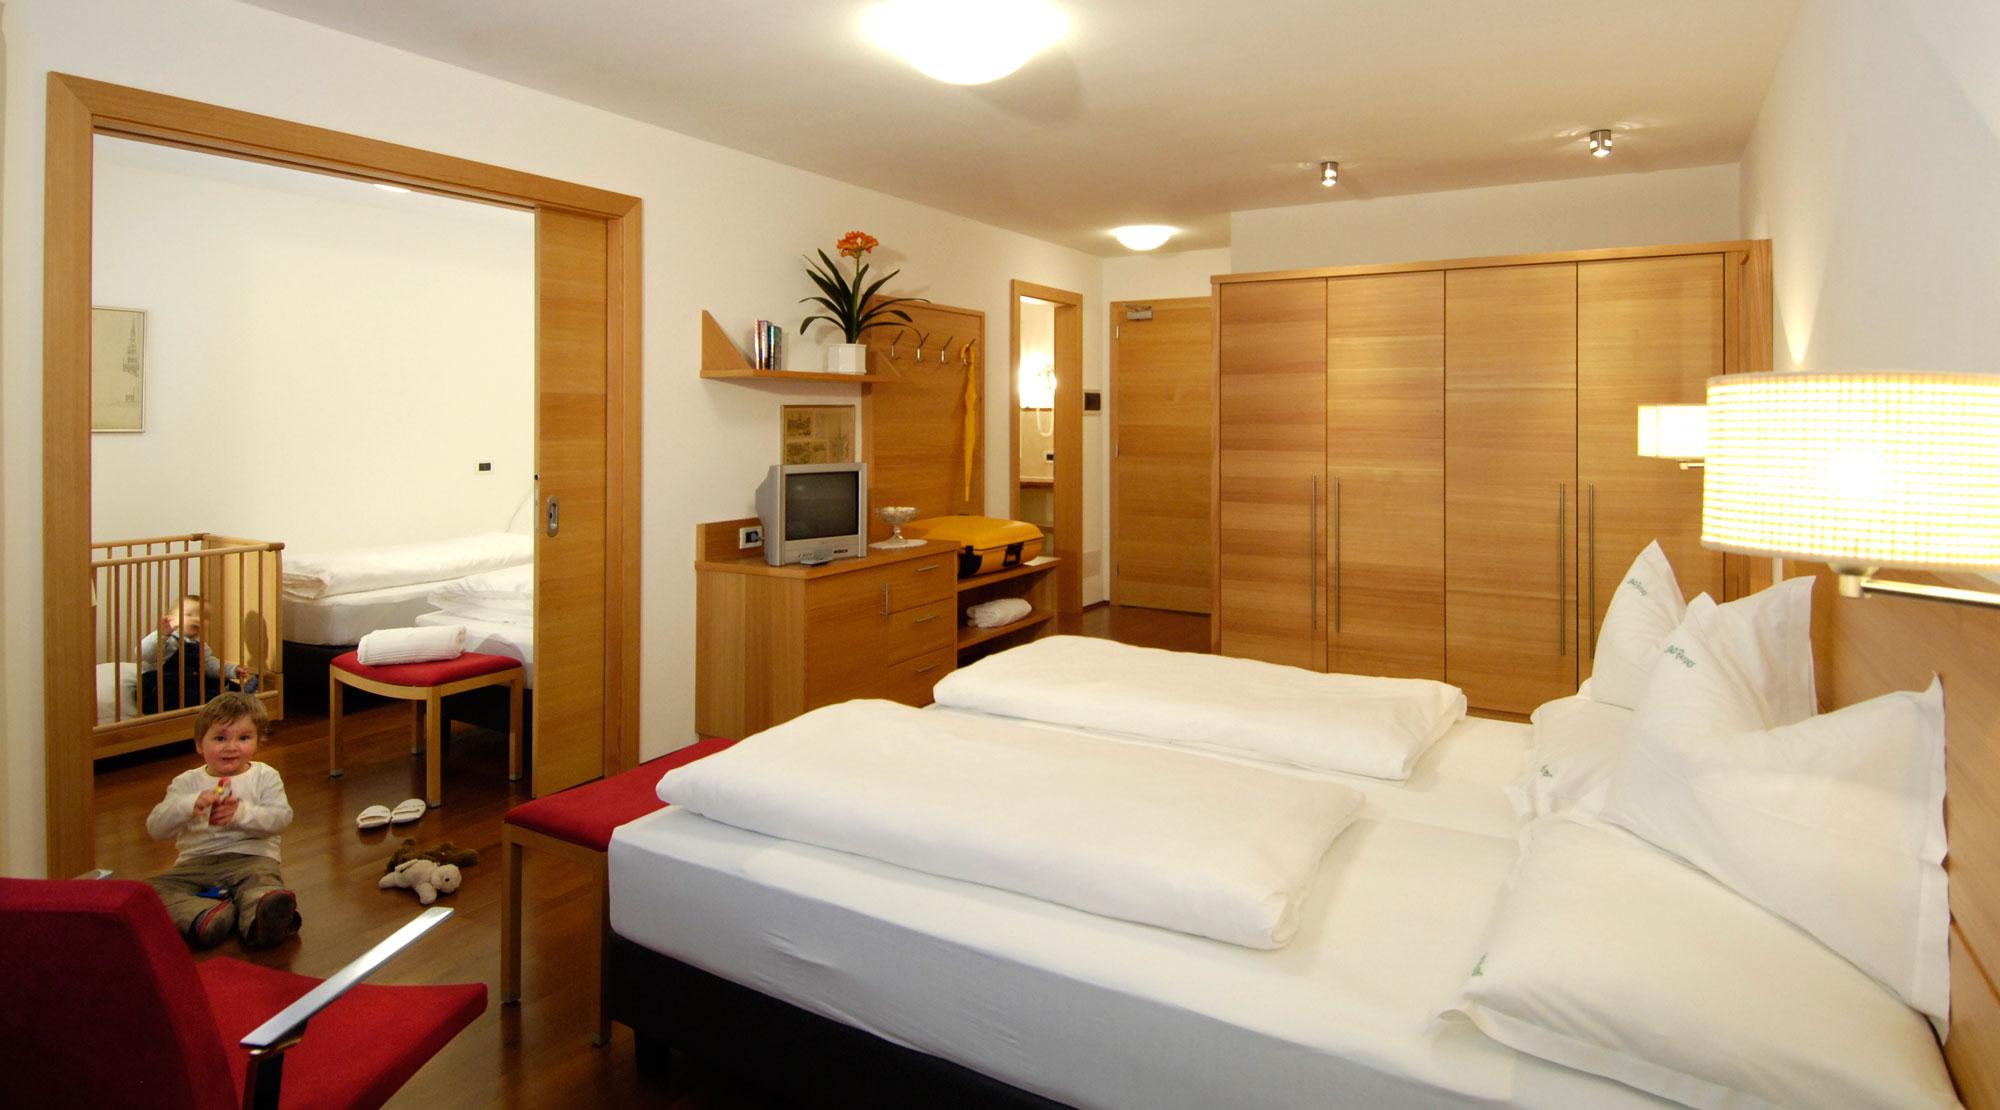 bad ratzes 4 star siusi allo sciliar. Black Bedroom Furniture Sets. Home Design Ideas